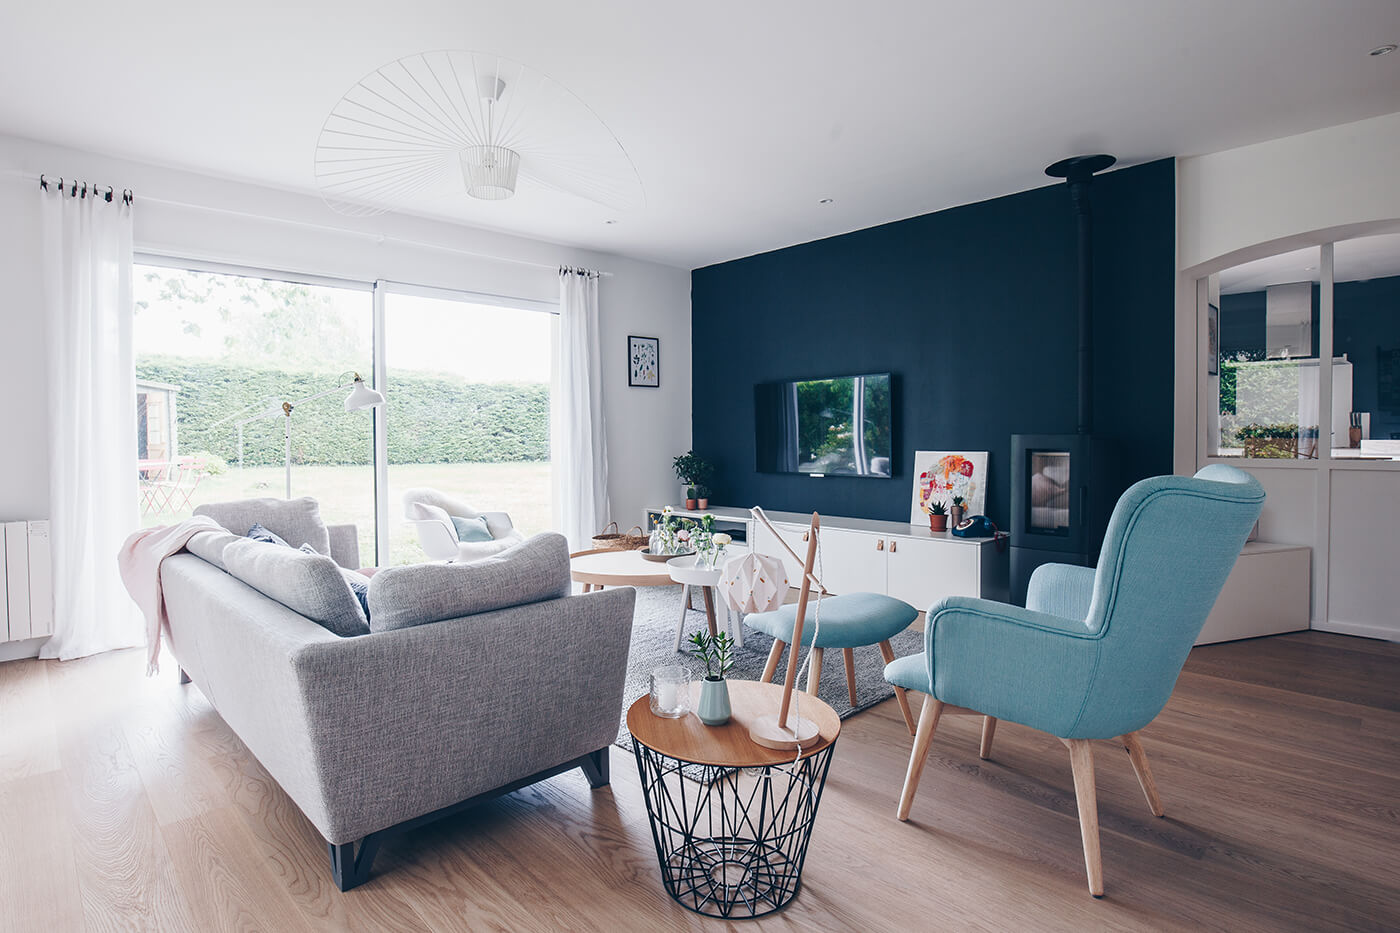 nemzetk zi lakberendez s diy tippek 1500 remek tlet egy helyen blogt r. Black Bedroom Furniture Sets. Home Design Ideas